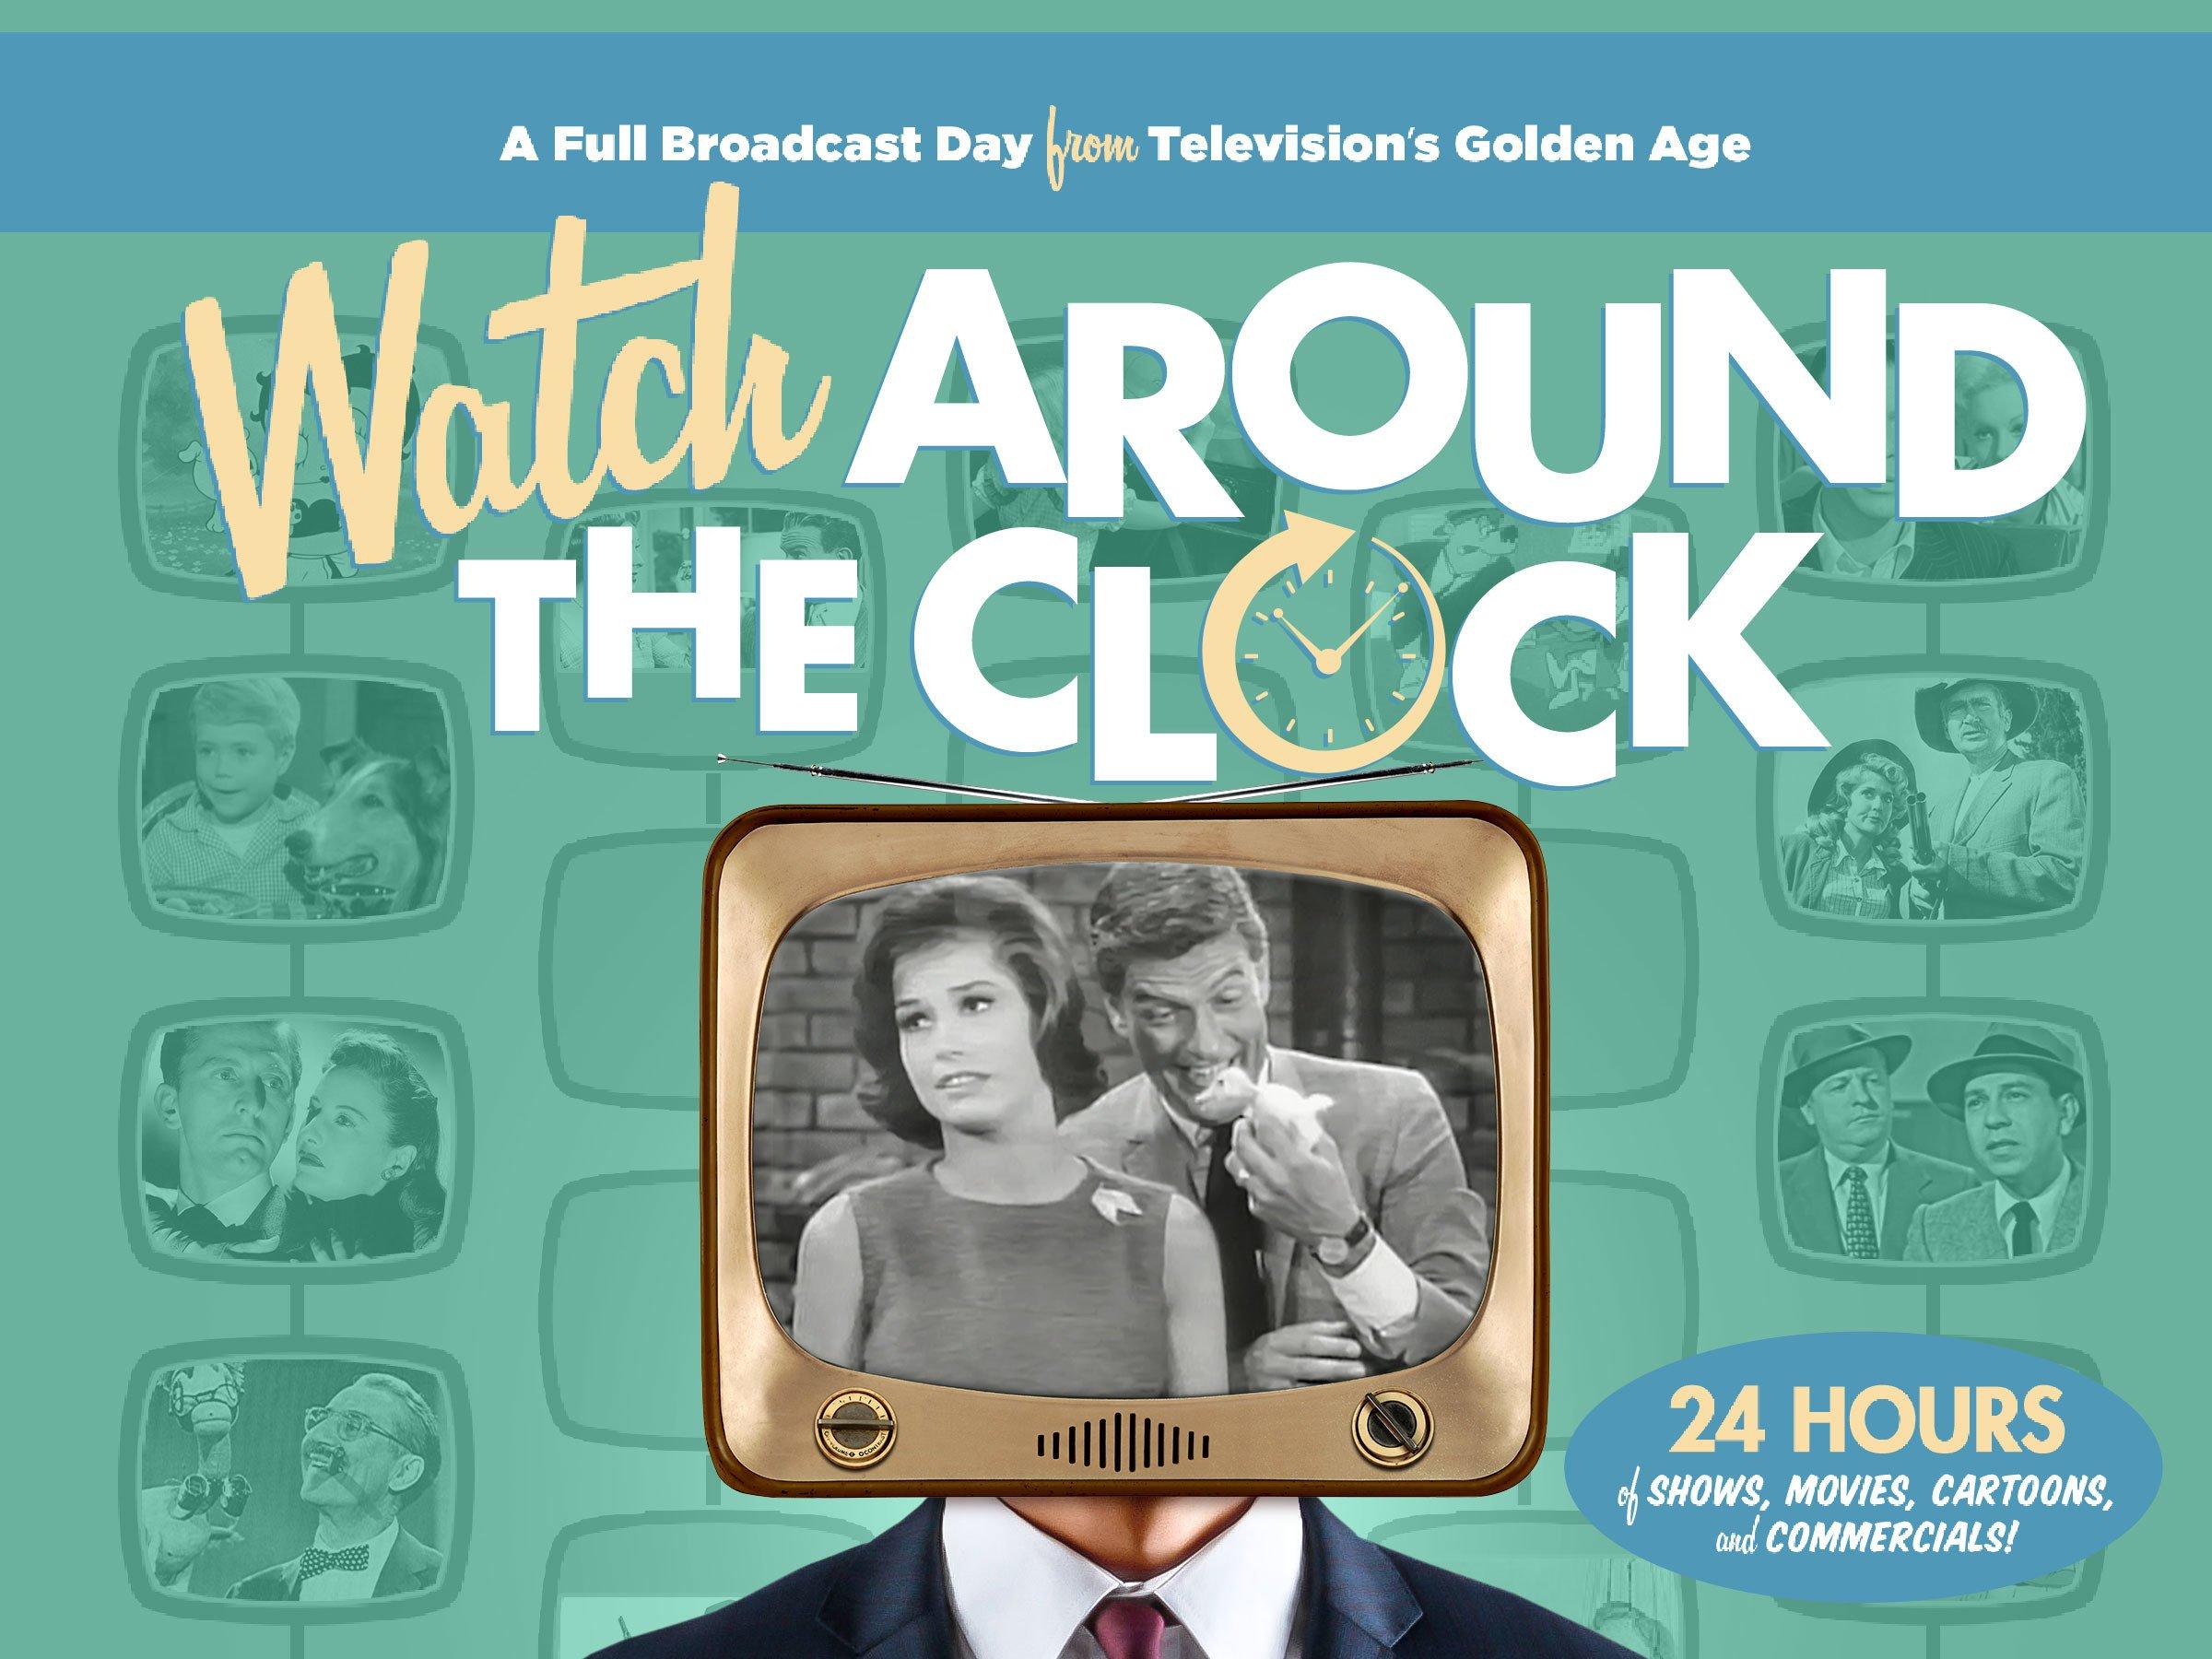 Watch Around the Clock B&W - Season 1